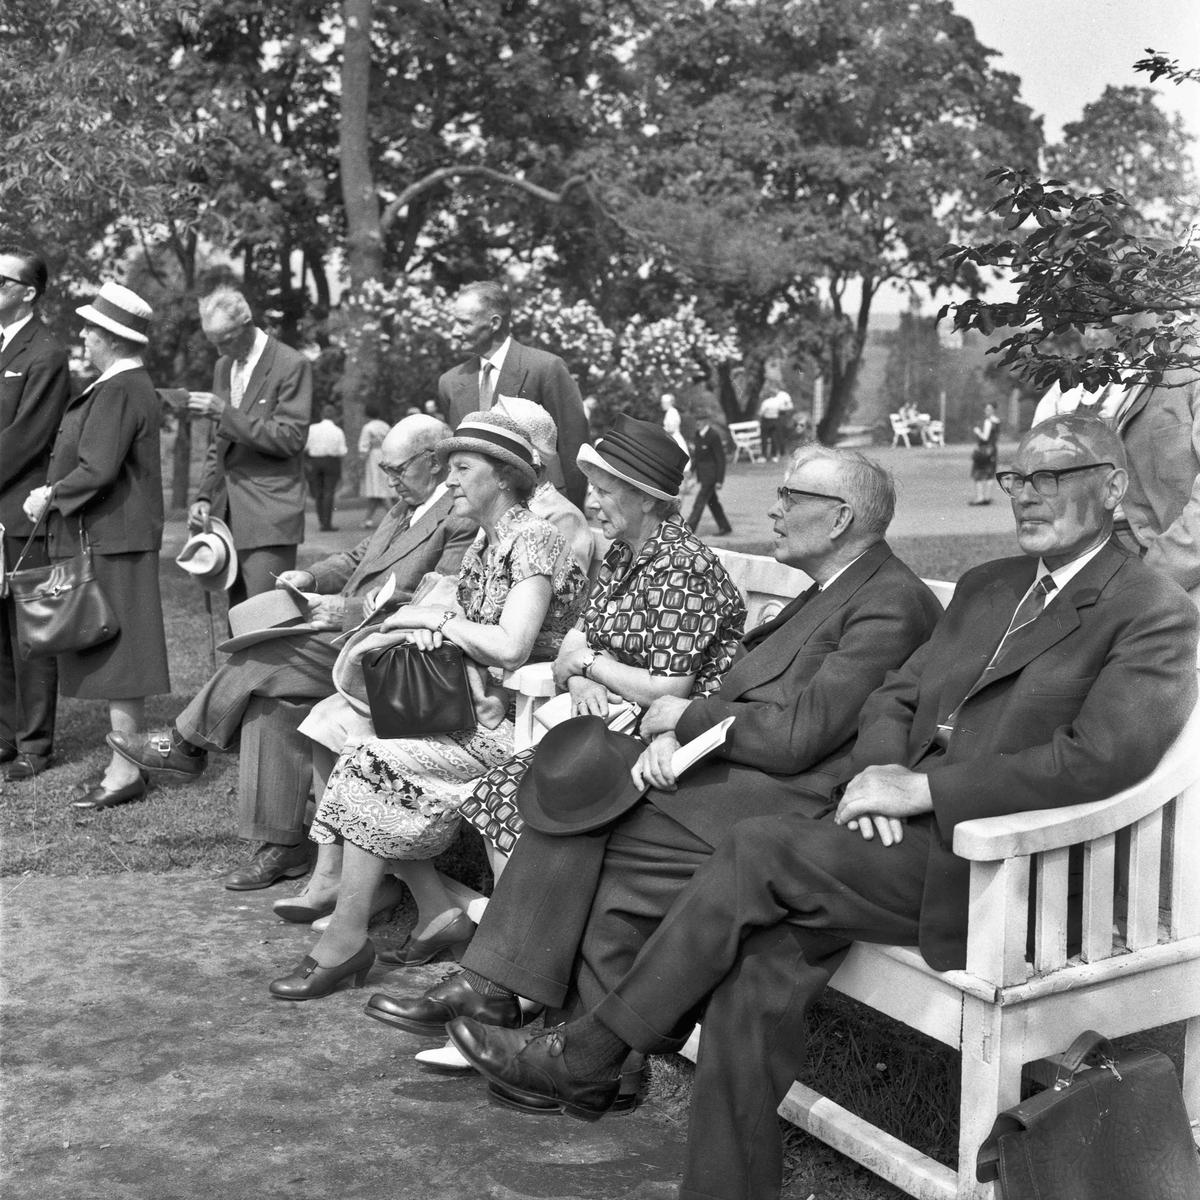 Eidsvoll Museumslag. Tilstelning ved Nicolai og Henrik Wergelands grav, samt Eidsvollbygningen 14.06.1964.